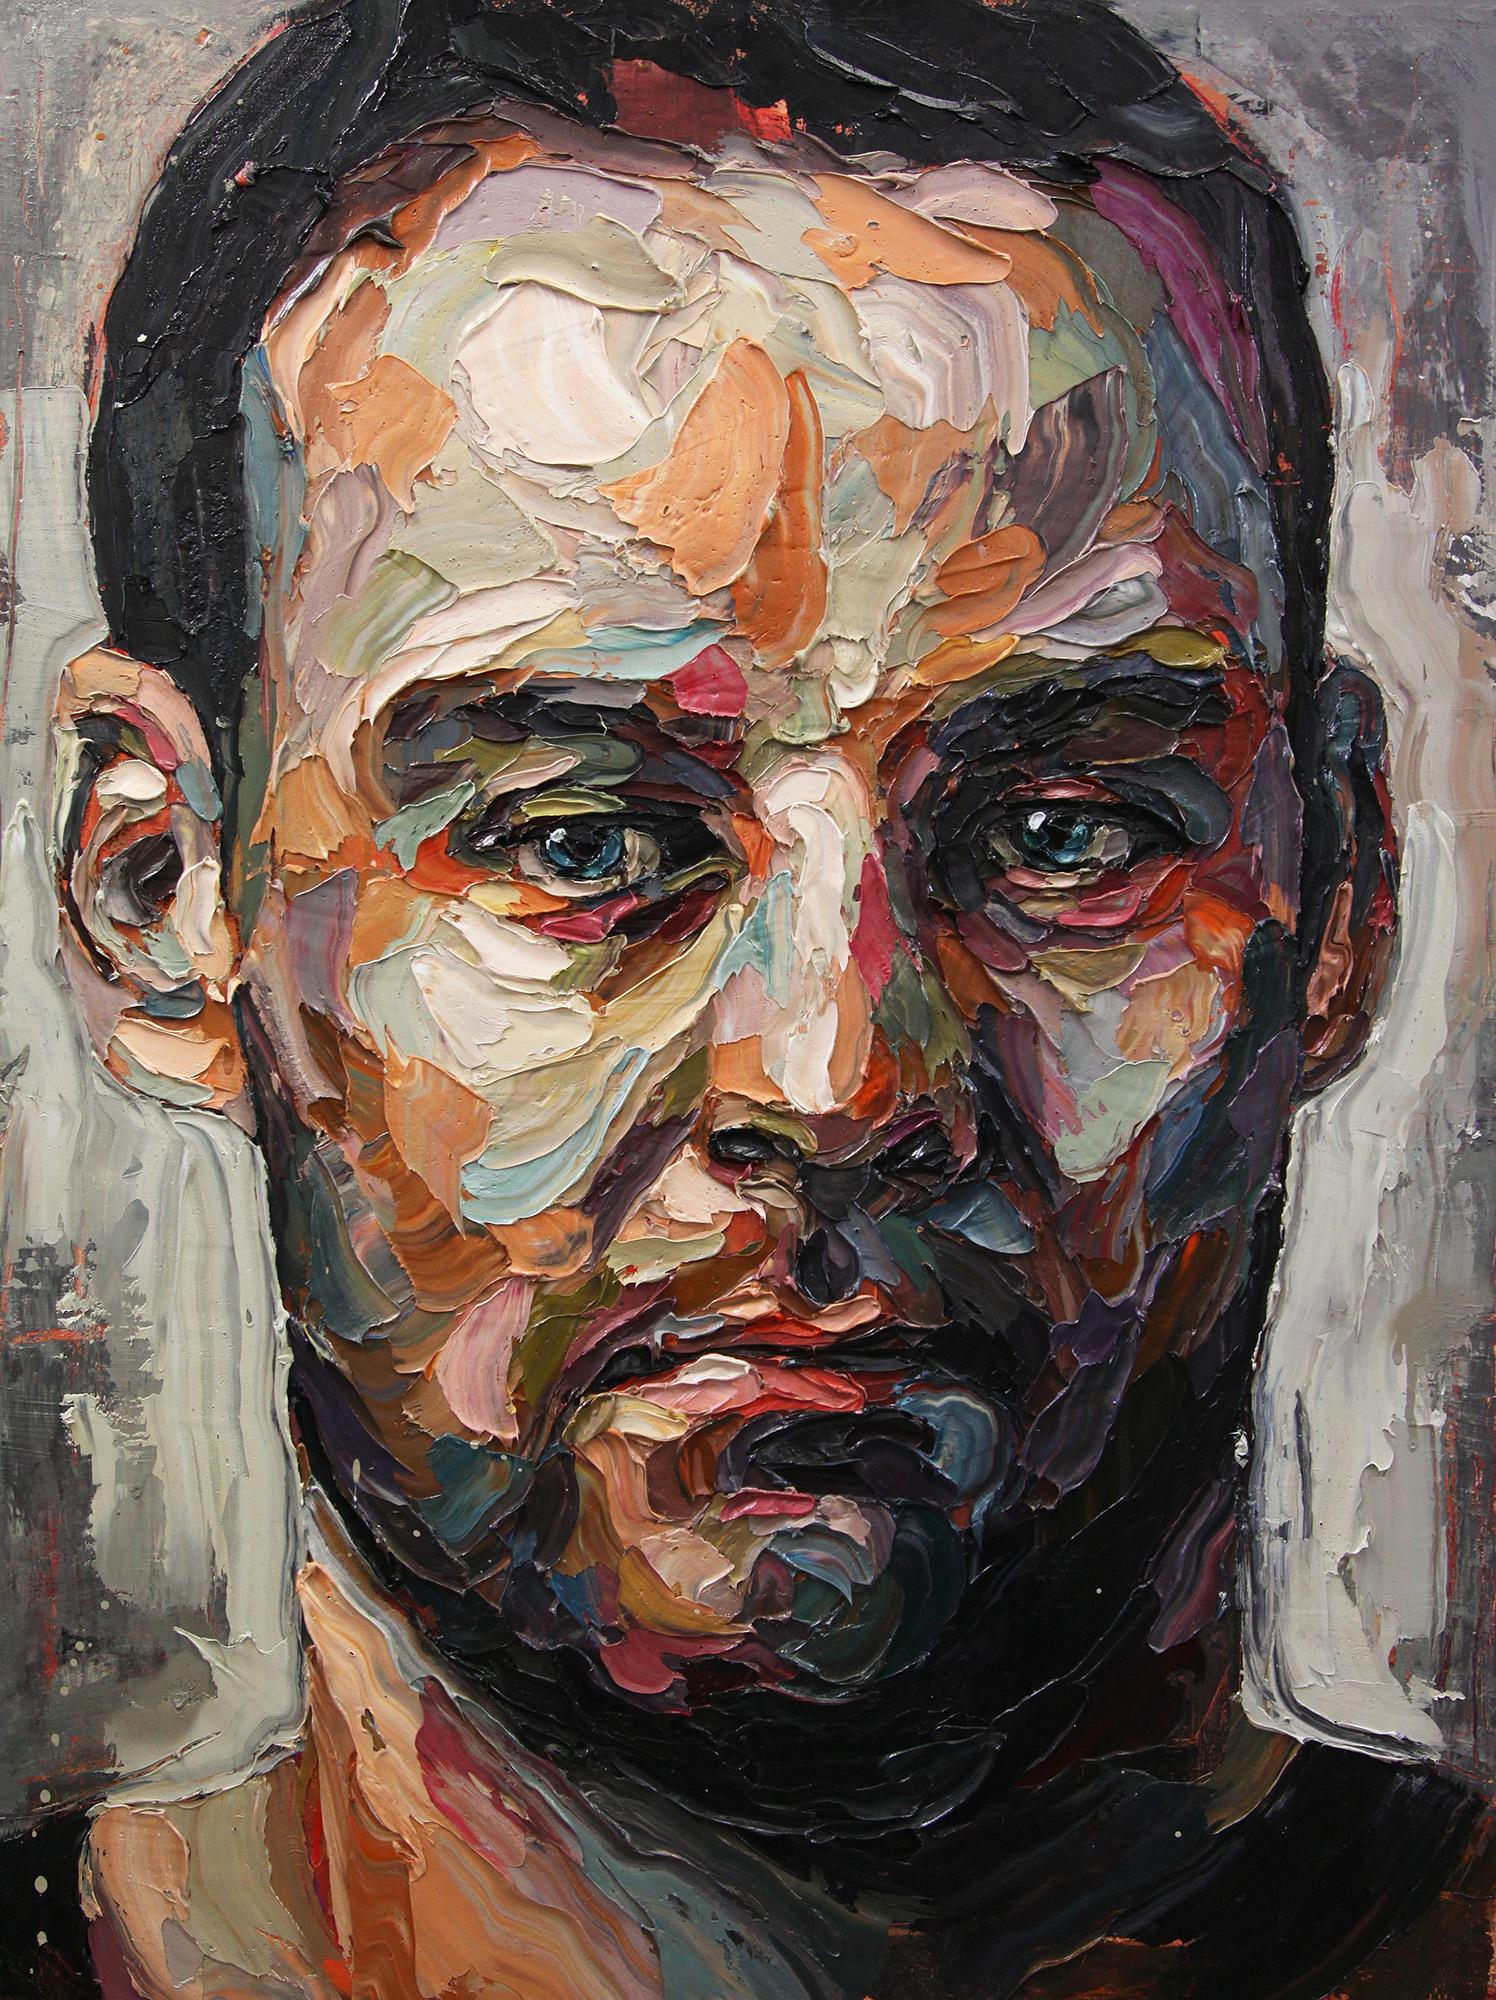 Joshua Miels, Fade to Silence, 2016